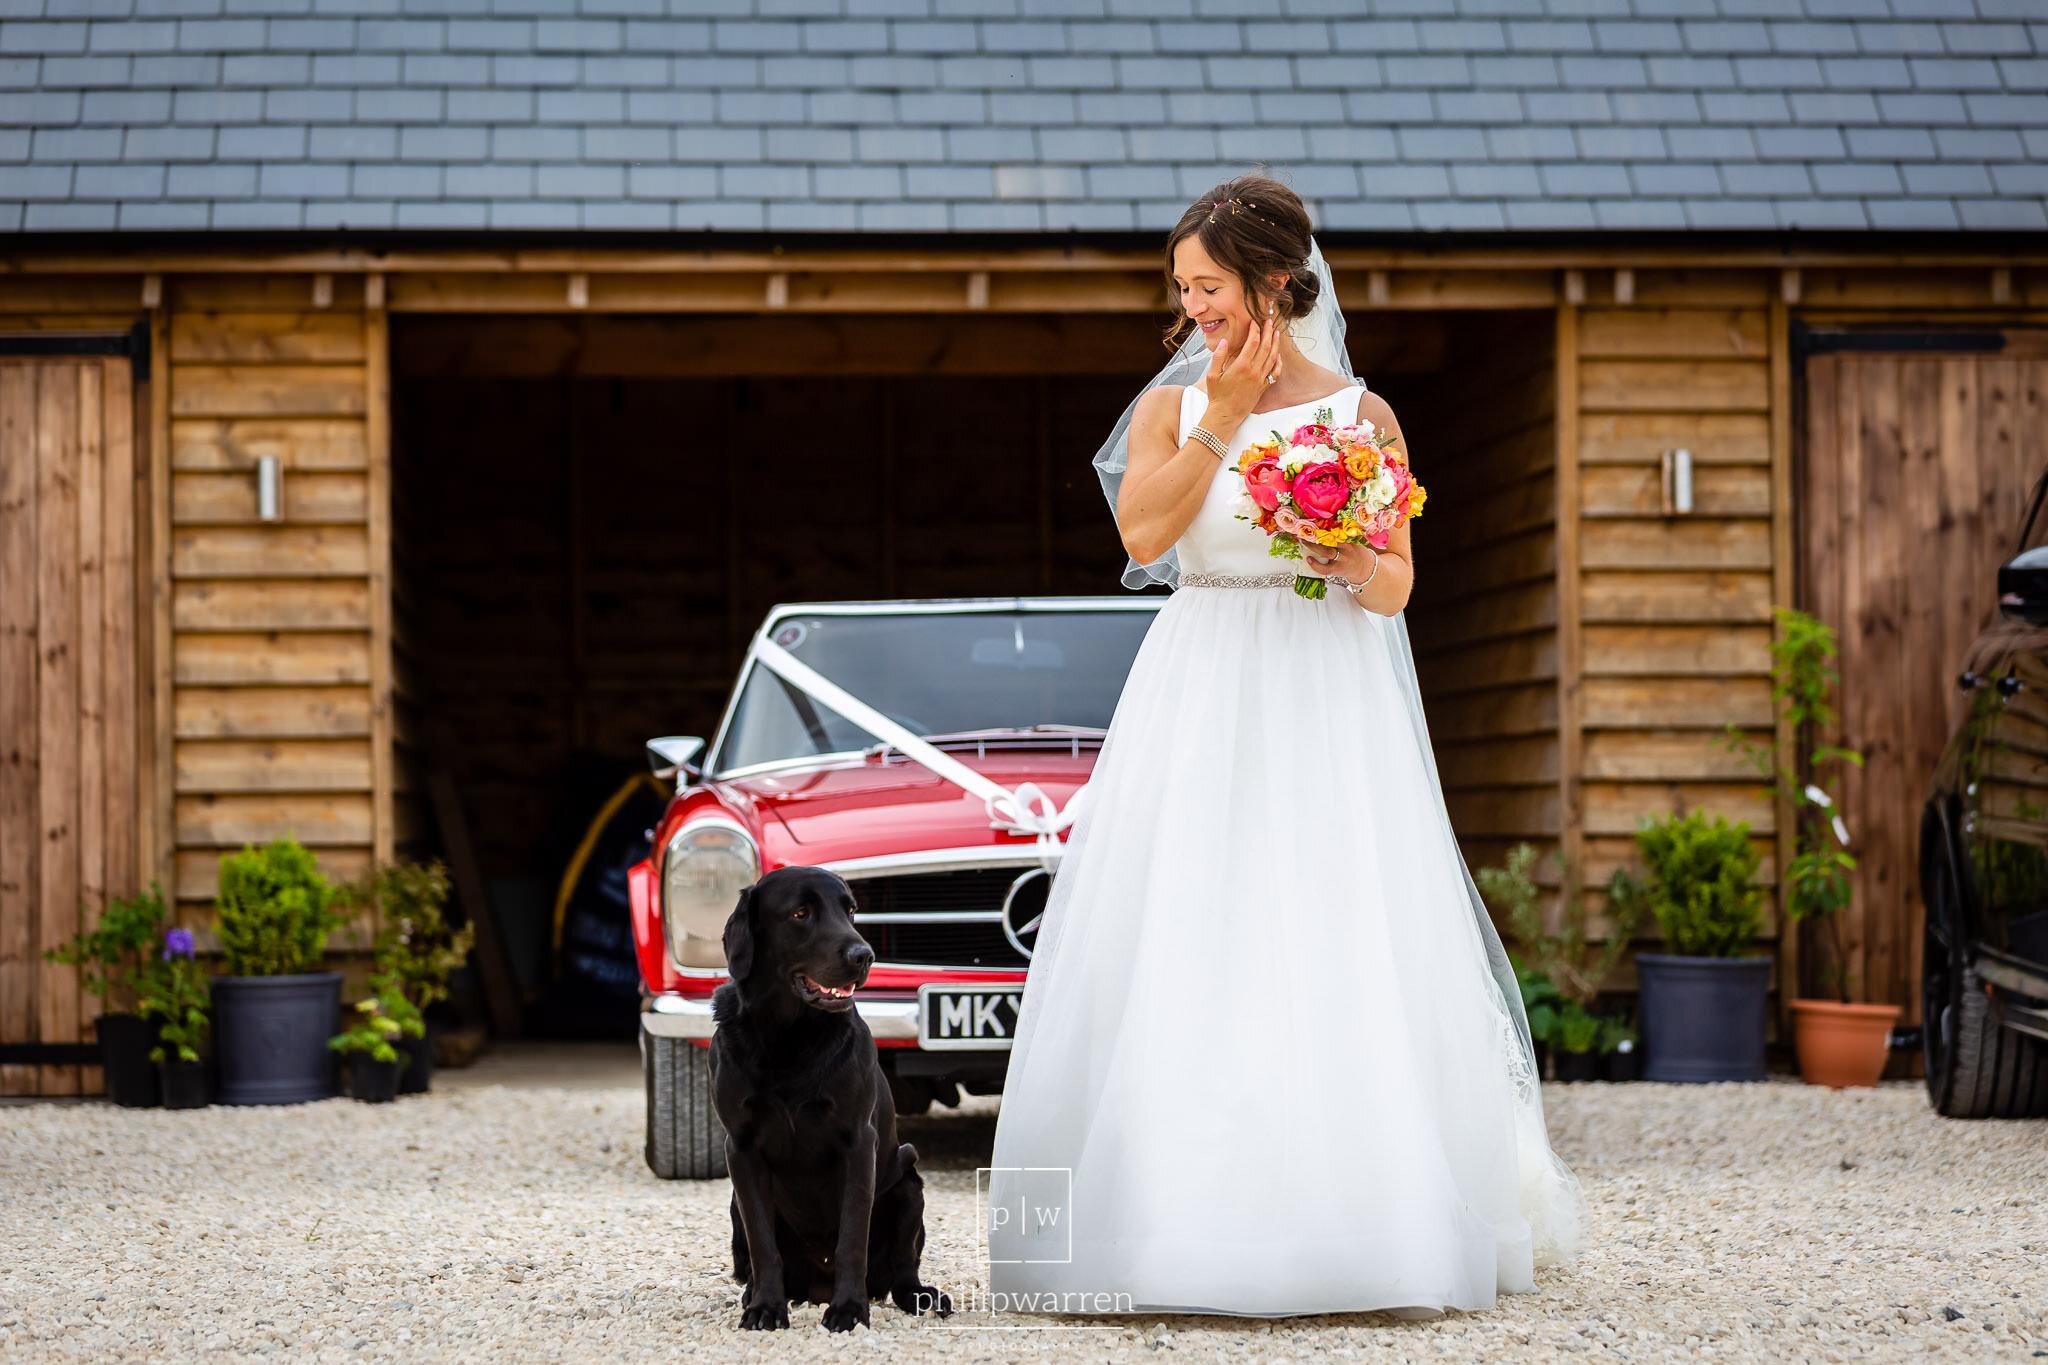 Countryside Marquee Wedding - 17.jpg